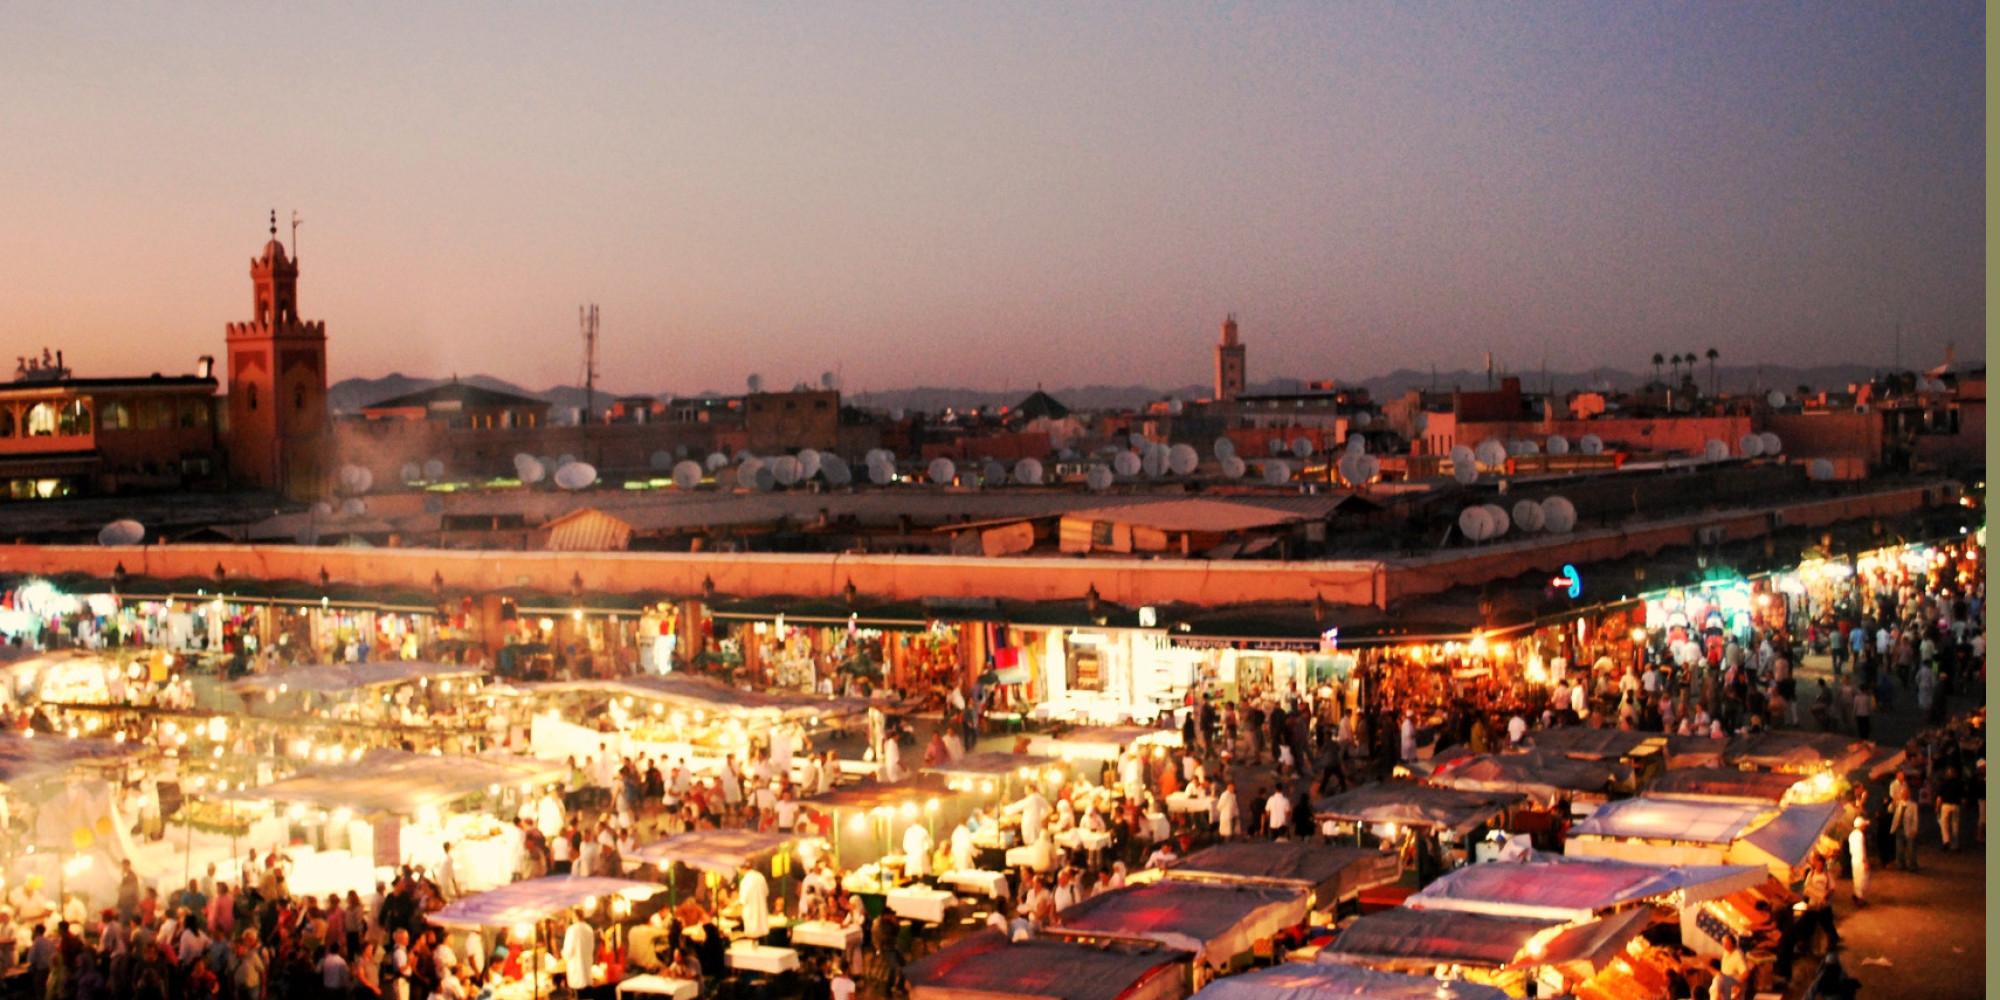 La place Jemaa el-Fna جامع الفناء, place des trépassés